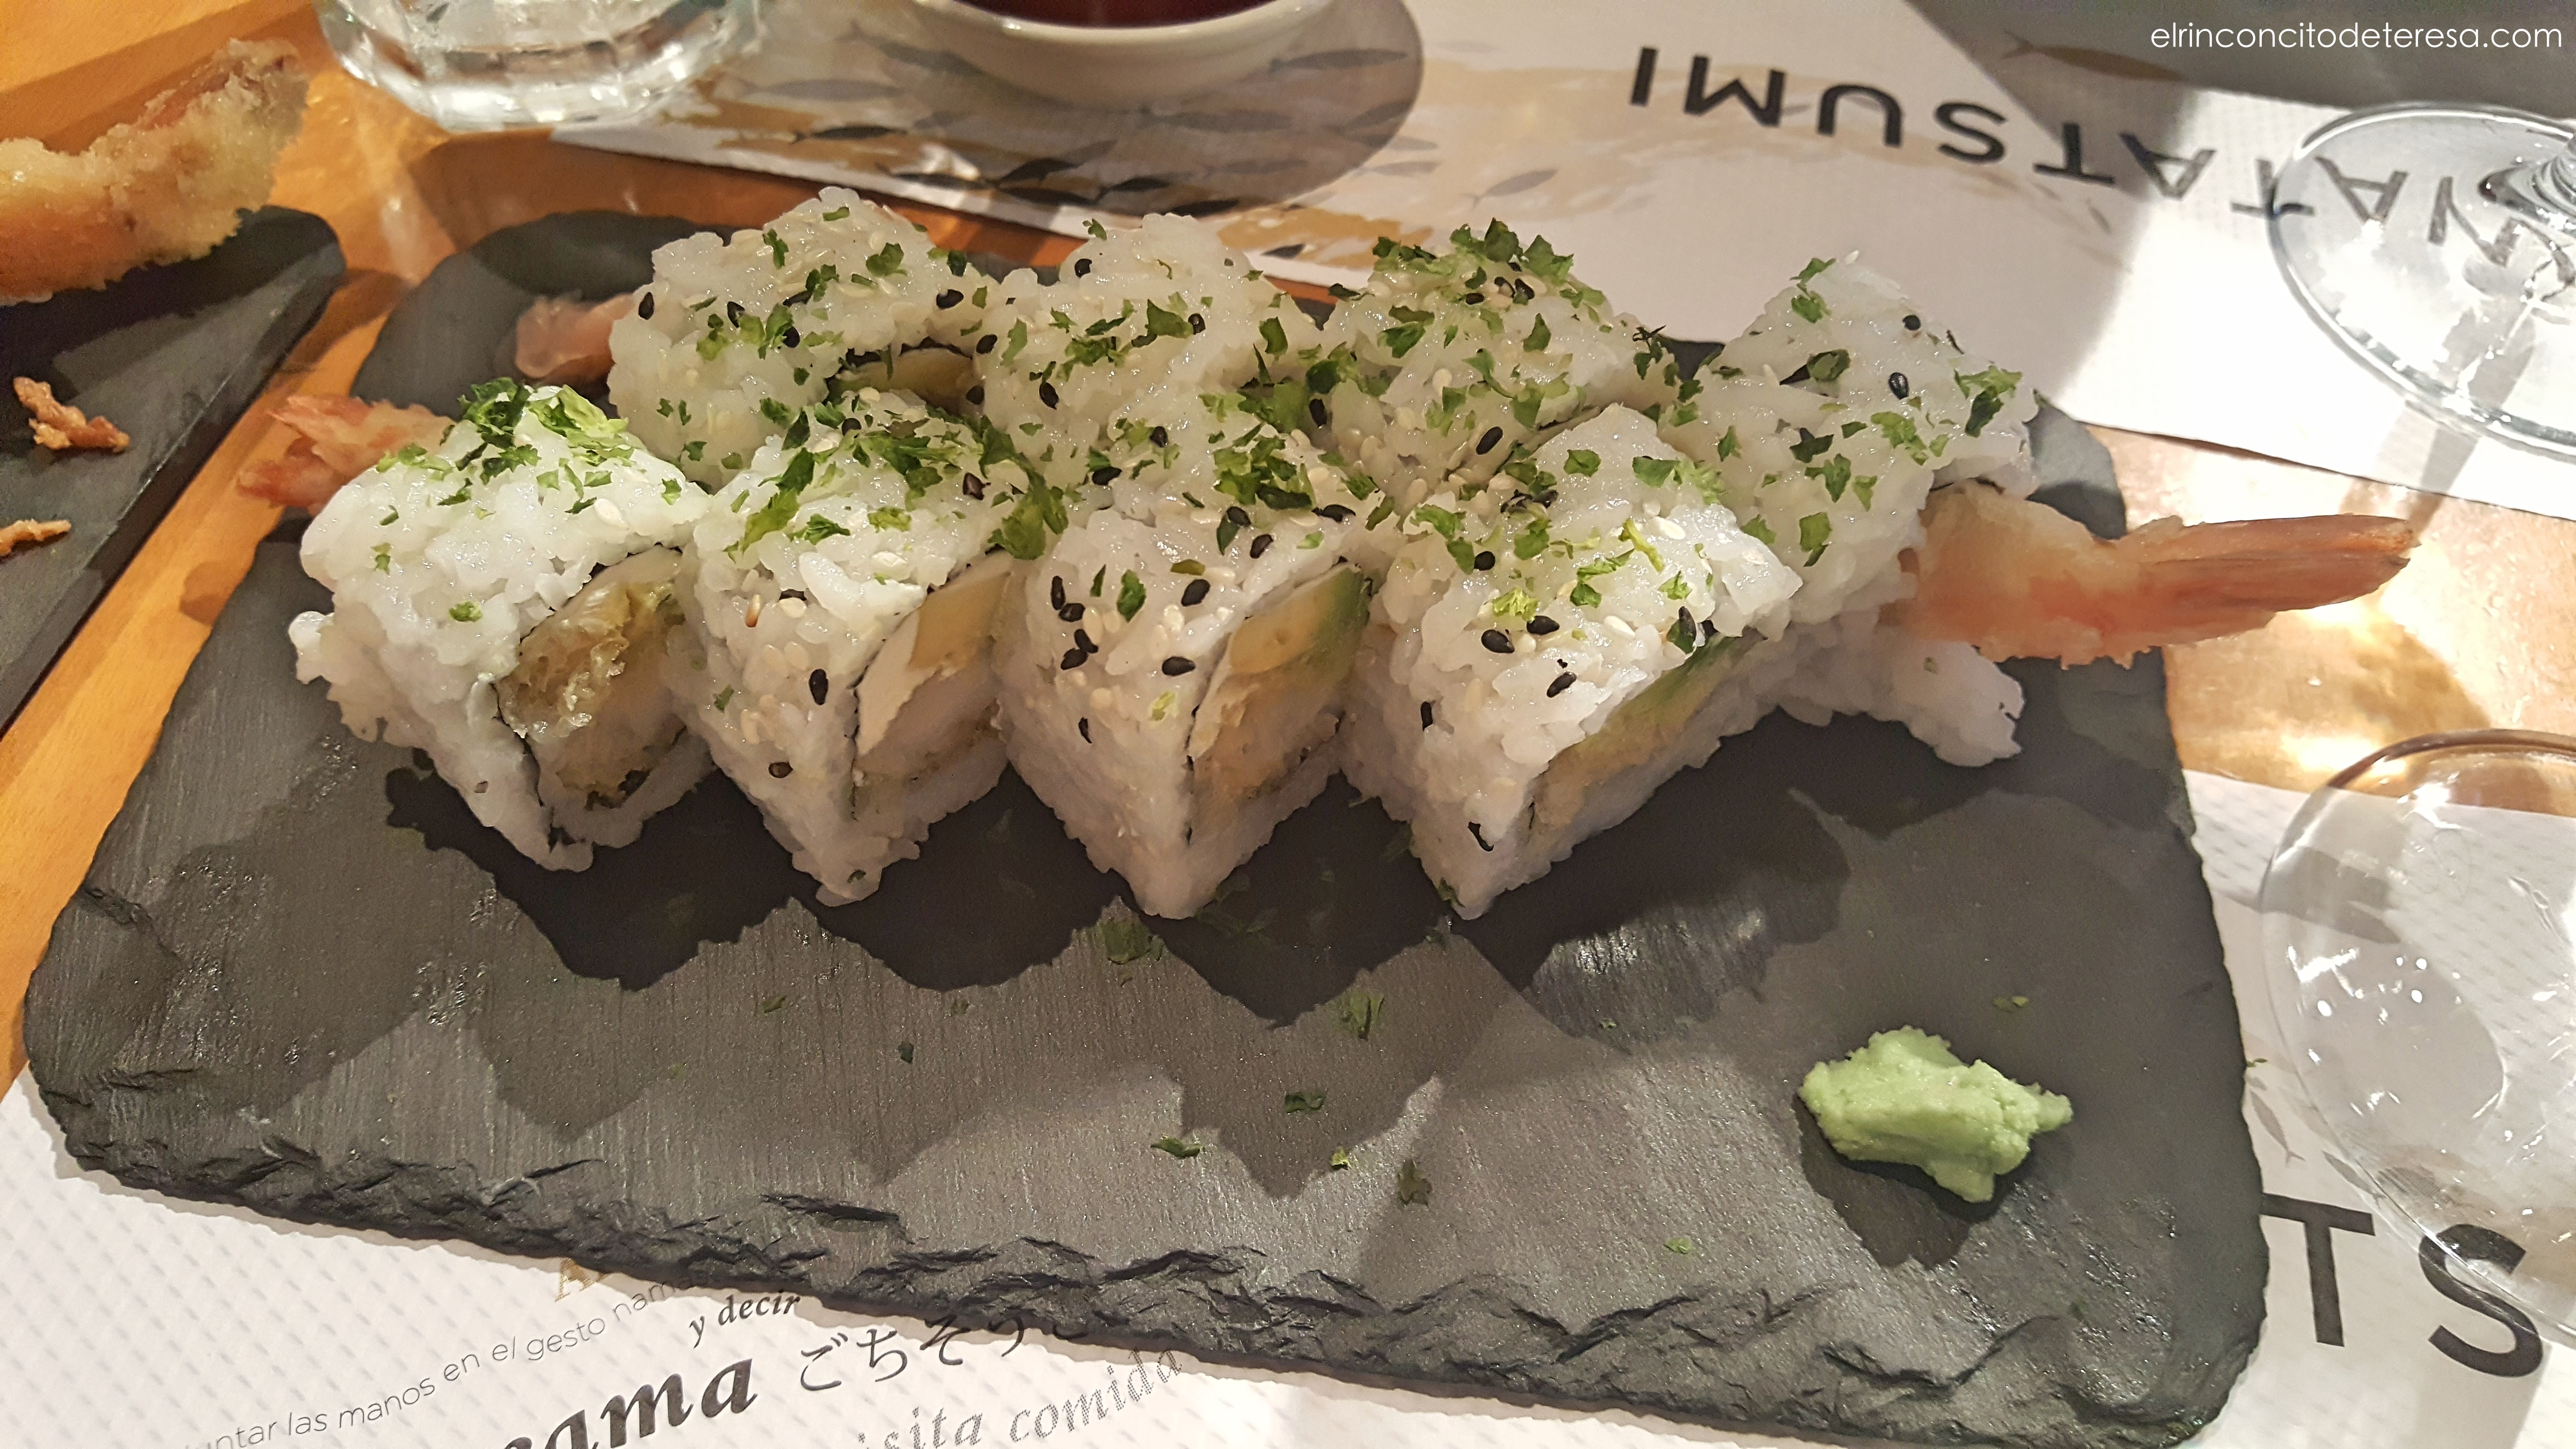 watatsumi-sushi-langostino-aguacate